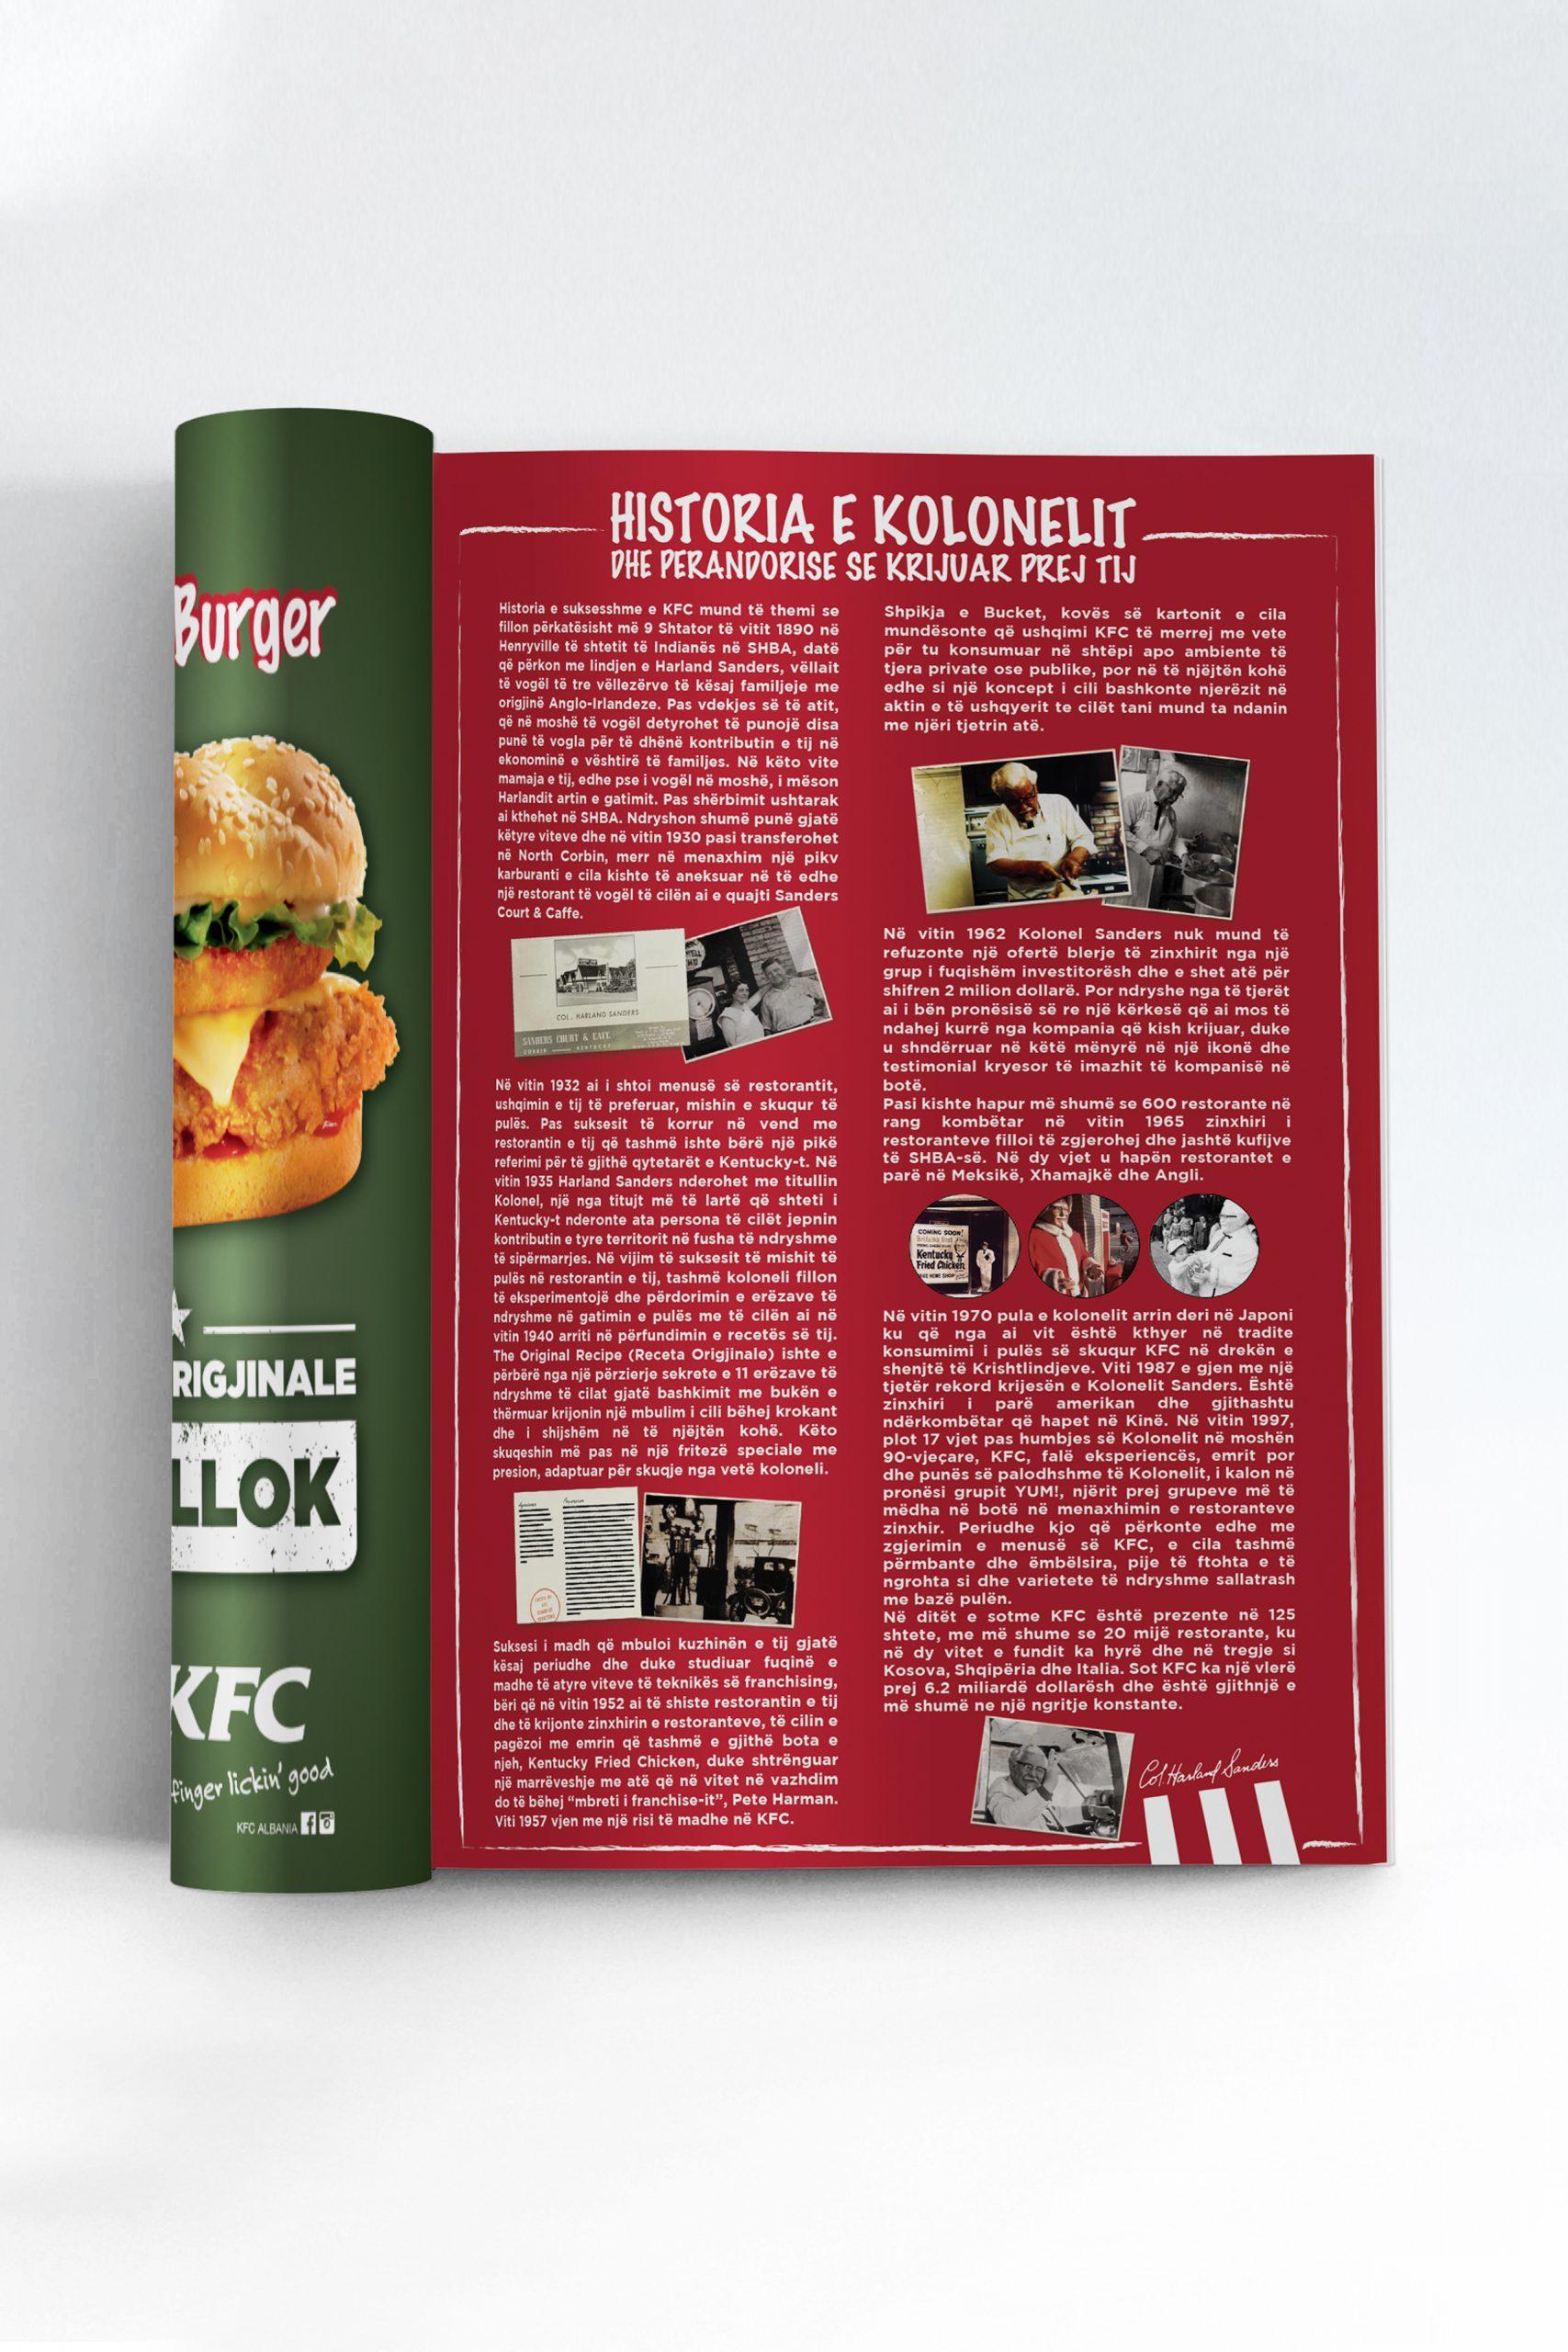 KFC, Social, Project Img 5 - Vatra Agency / Founder & CEO Gerton Bejo